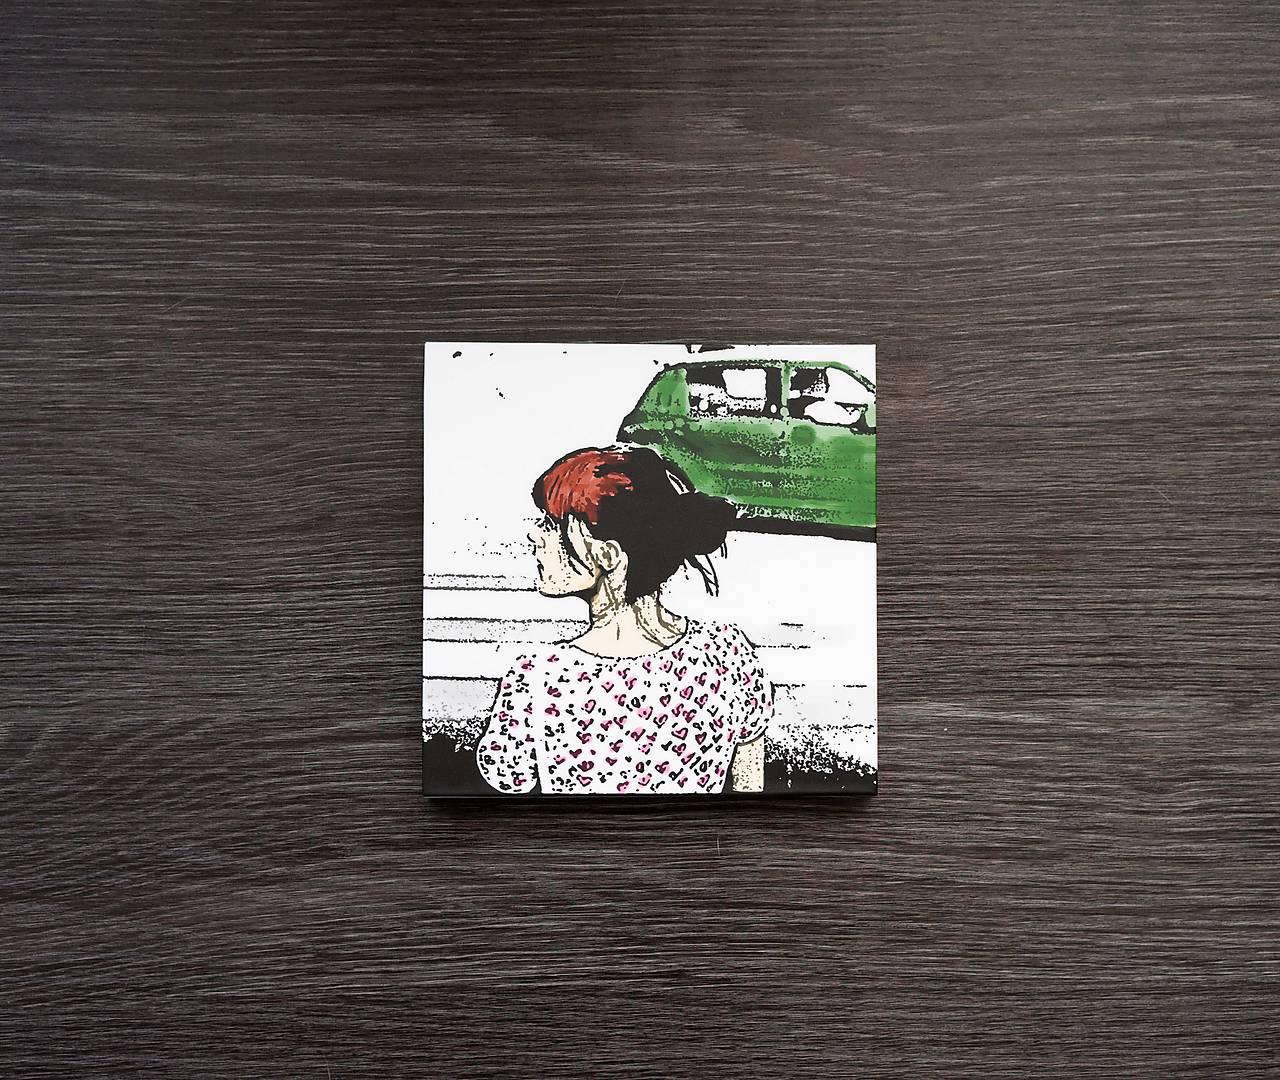 Papiernictvo - Leporelo s autorskou ilustráciou ,,Cesta do Optimy,, - 8624239_